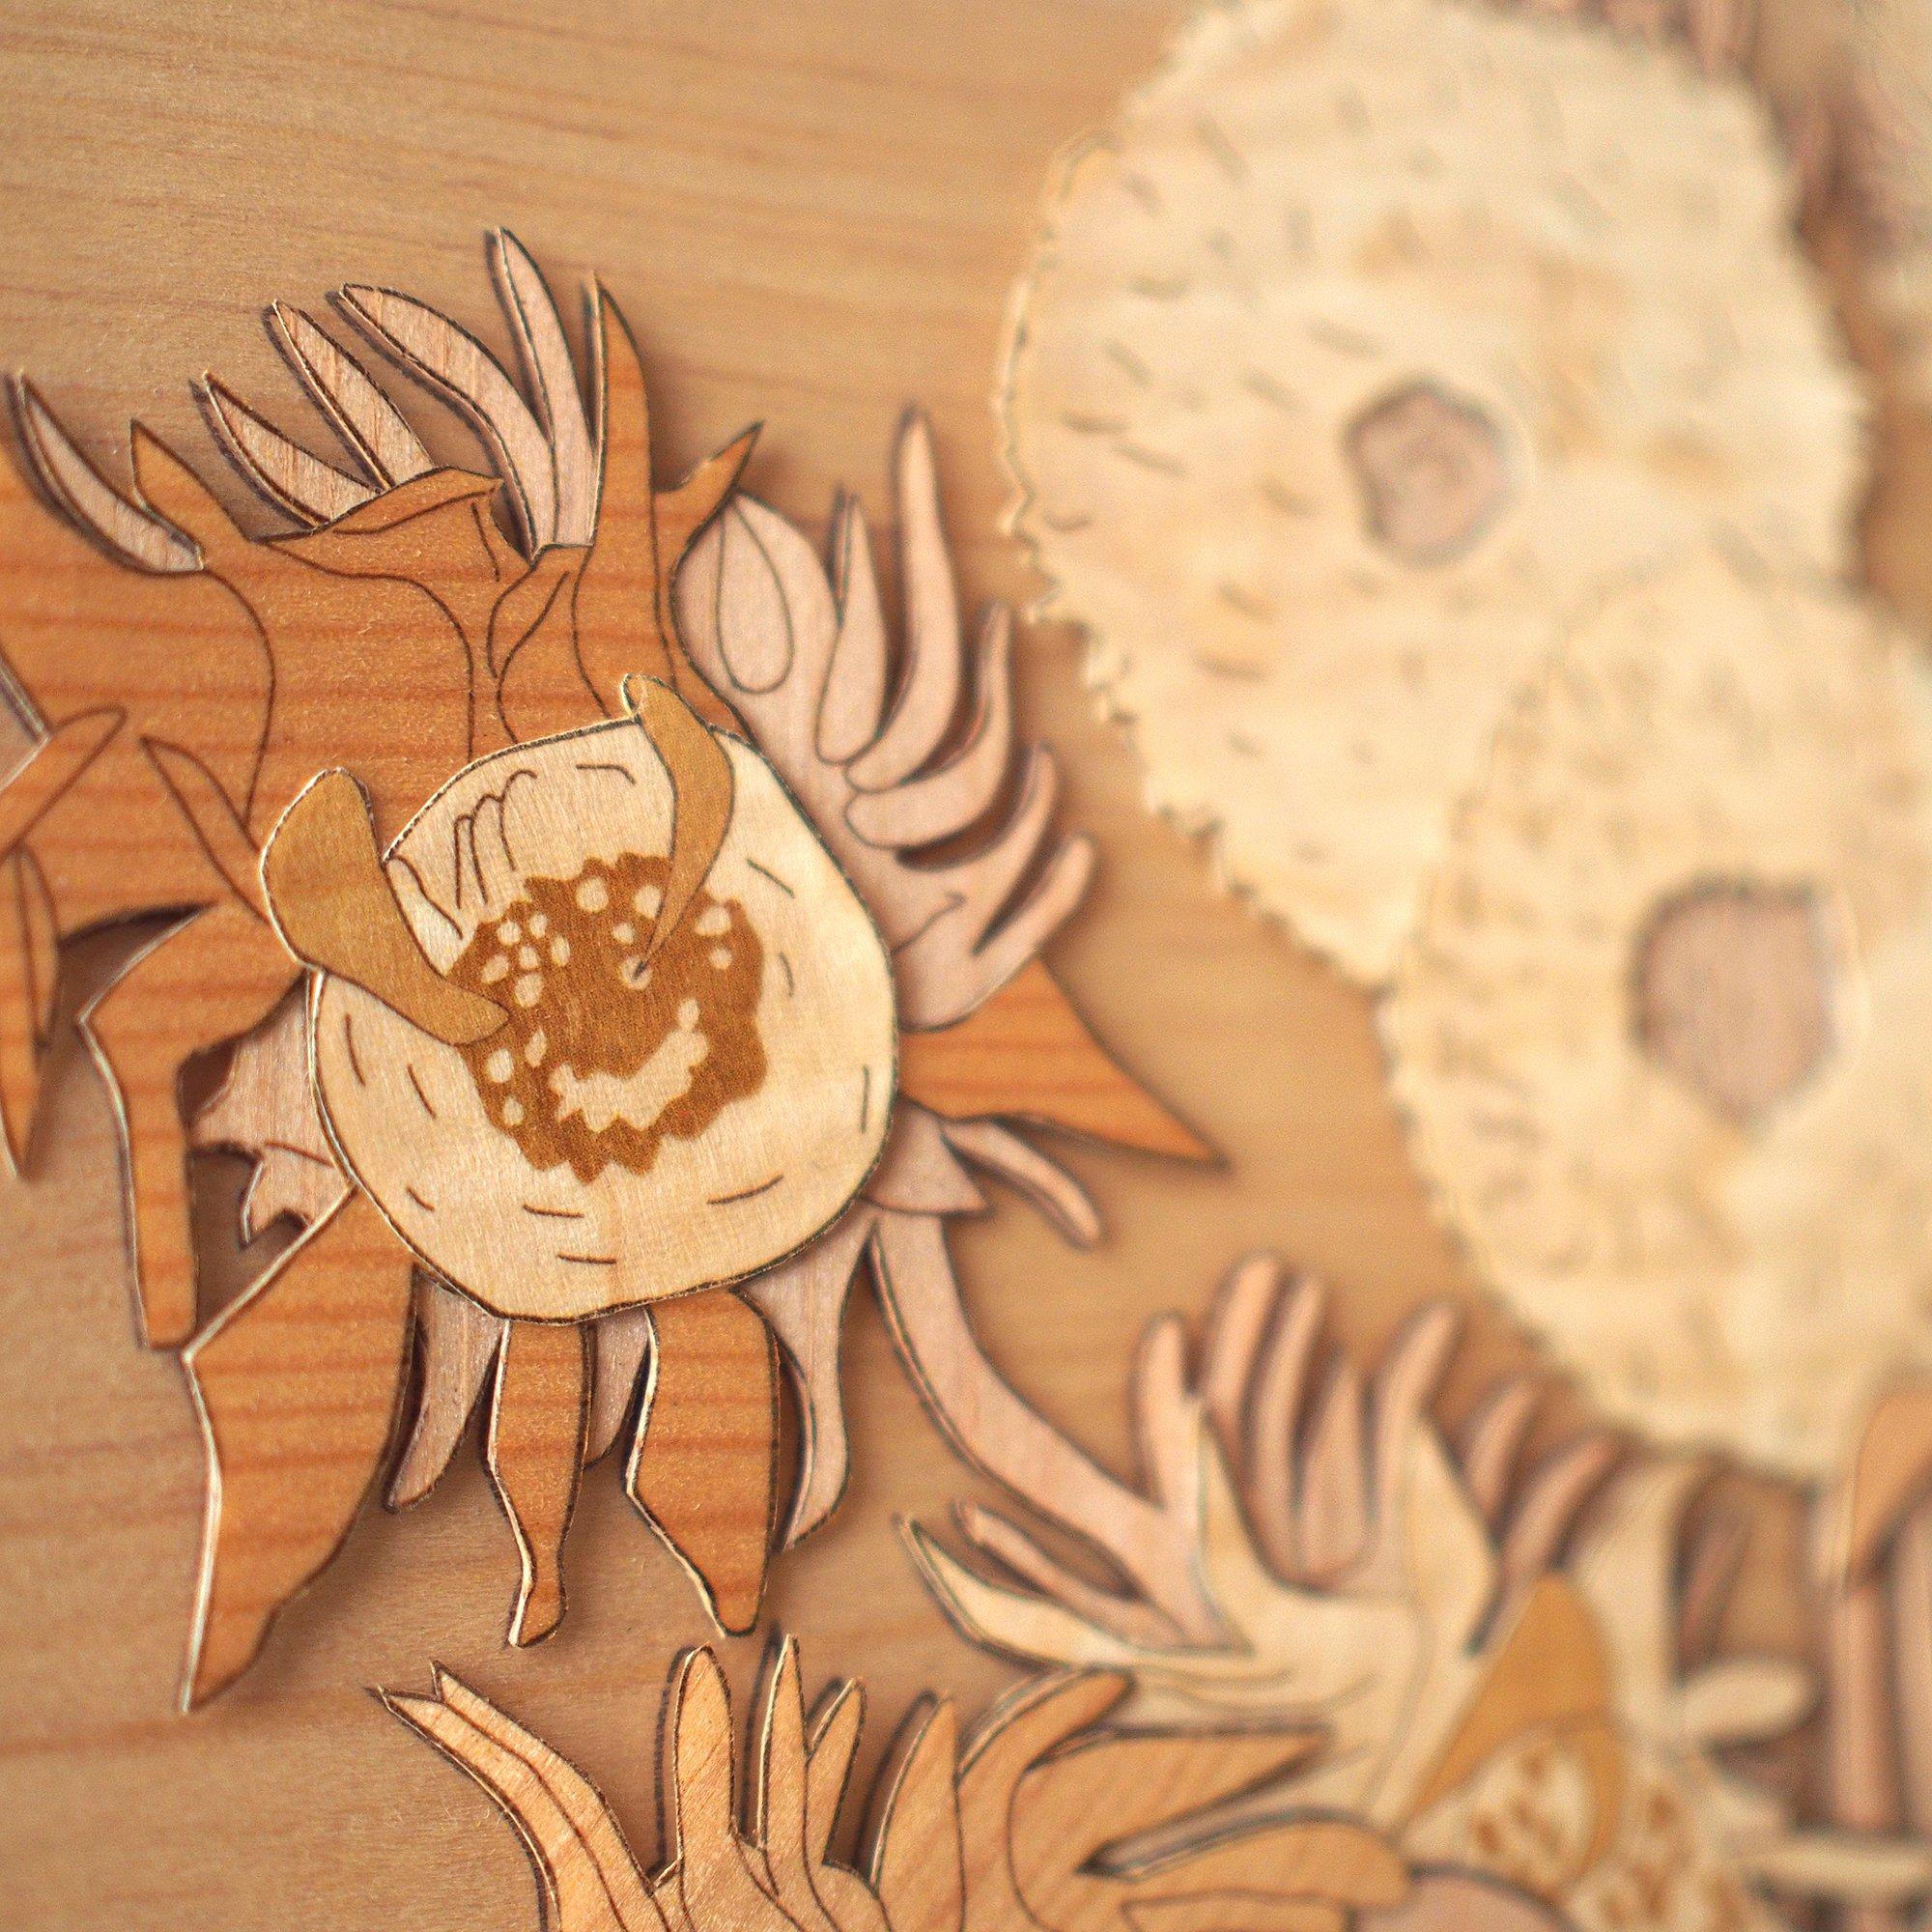 KINOWA Wooden Art Kit Kiharie Sunflowers Made in Japan by KINOWA (Image #9)